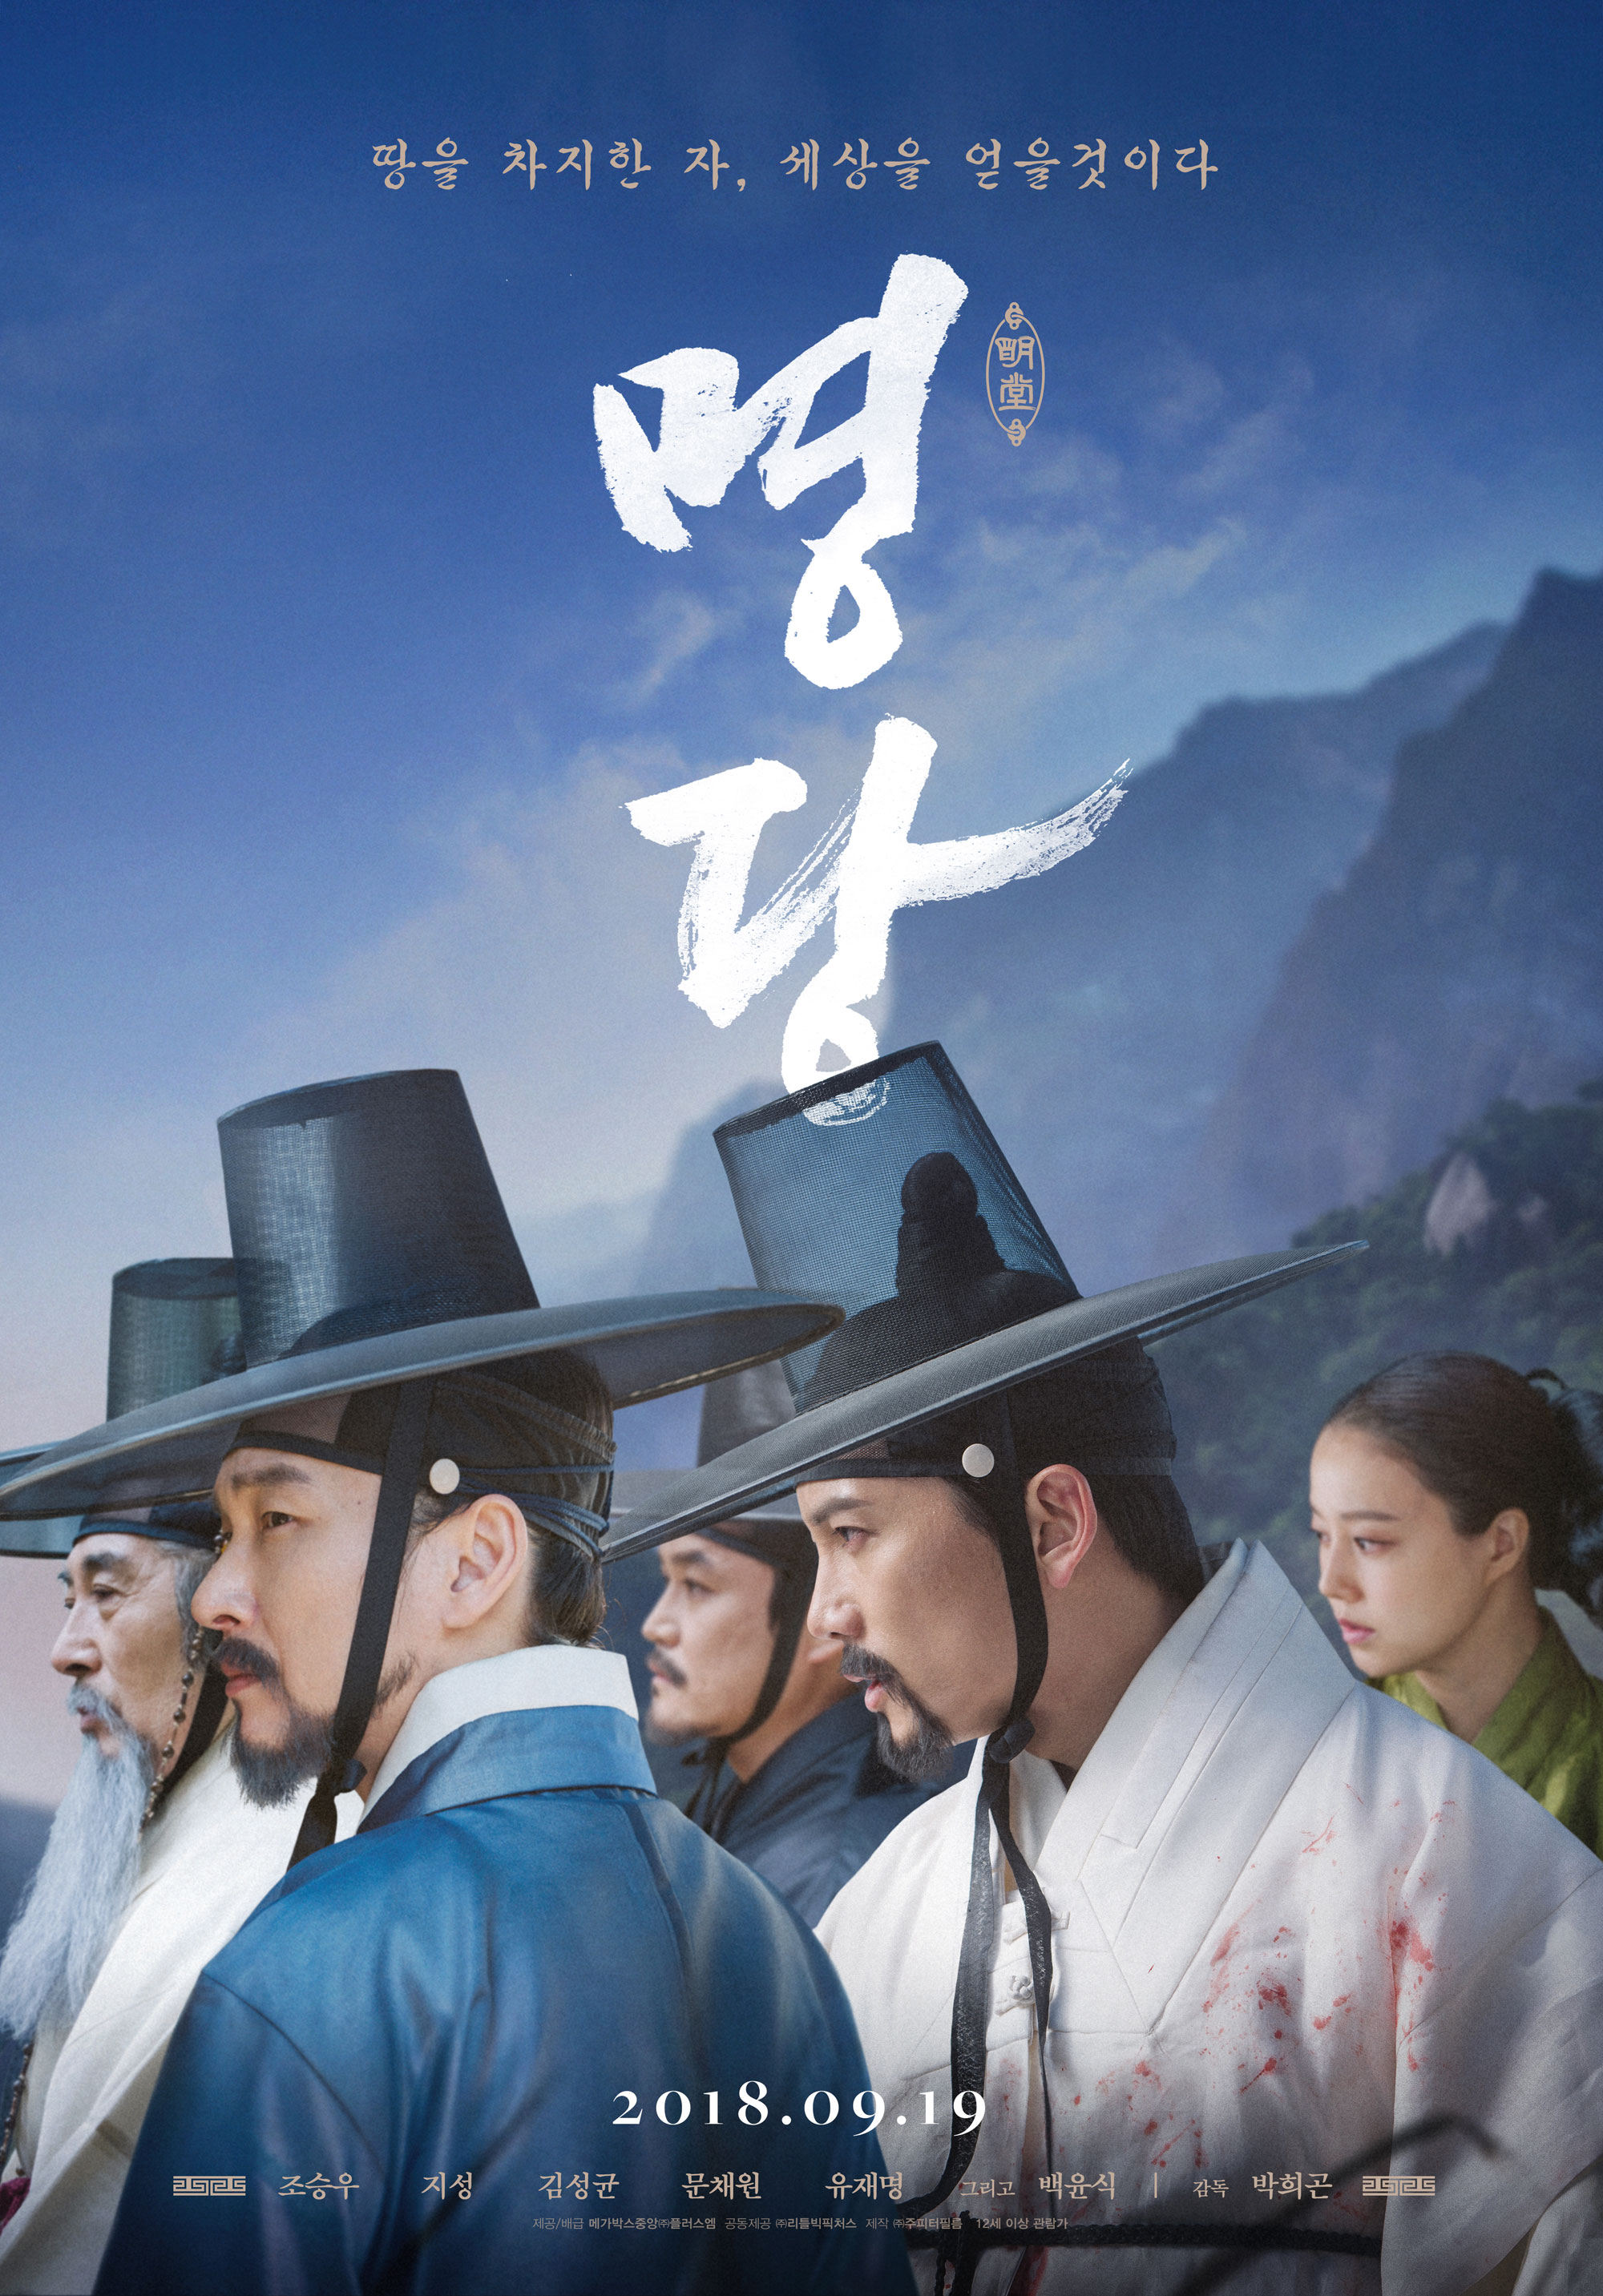 Korean Films Images Feng Shui Hd Fond Décran And Background Photos